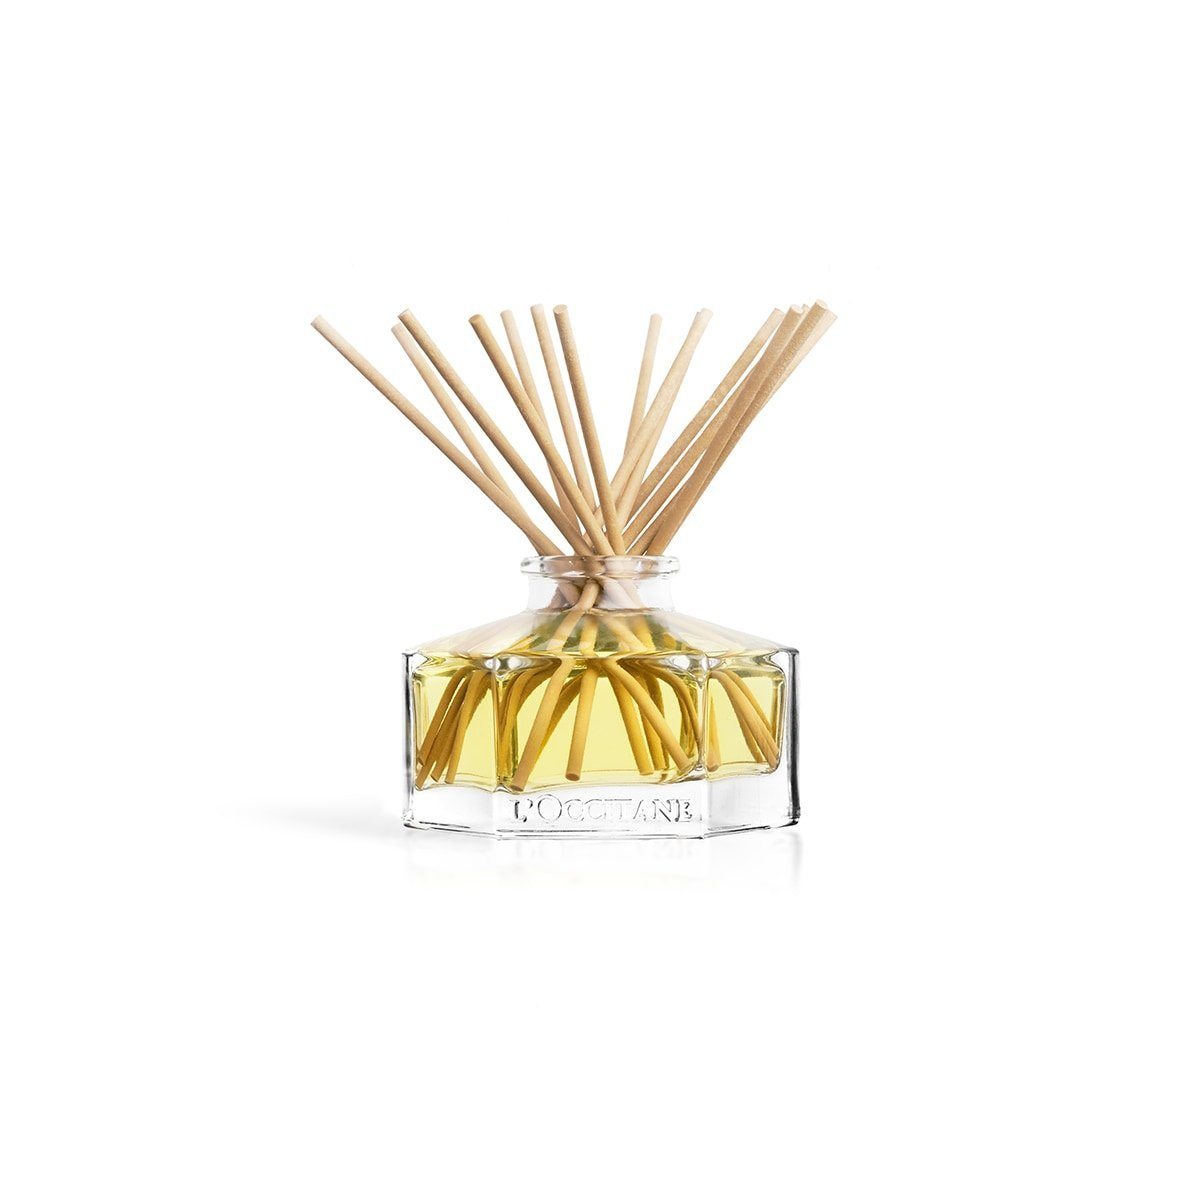 L'Occitane  Home Perfume Diffuser Kit